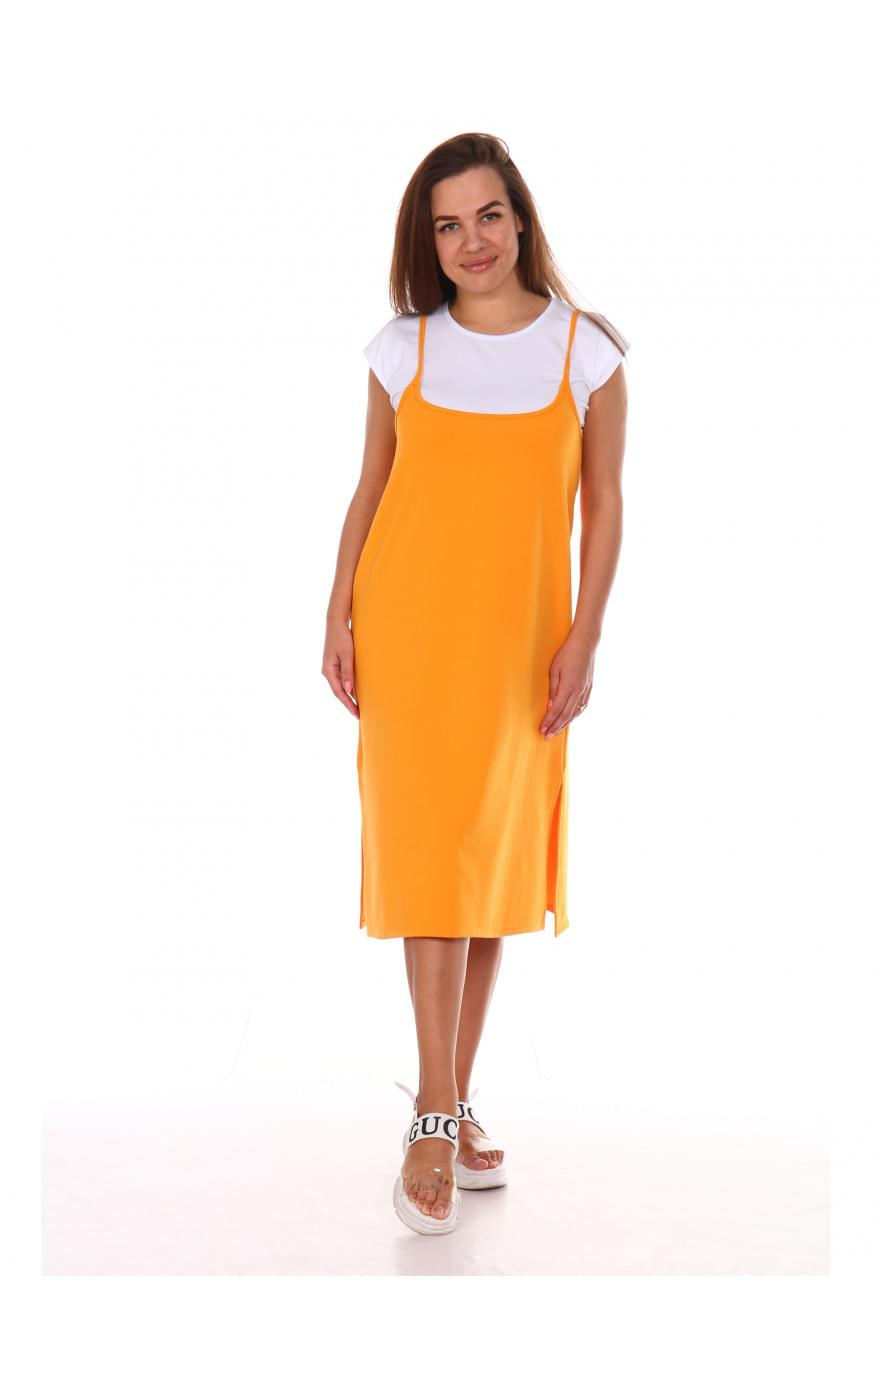 Сарафан Люси-2,оранжевое, 551ор